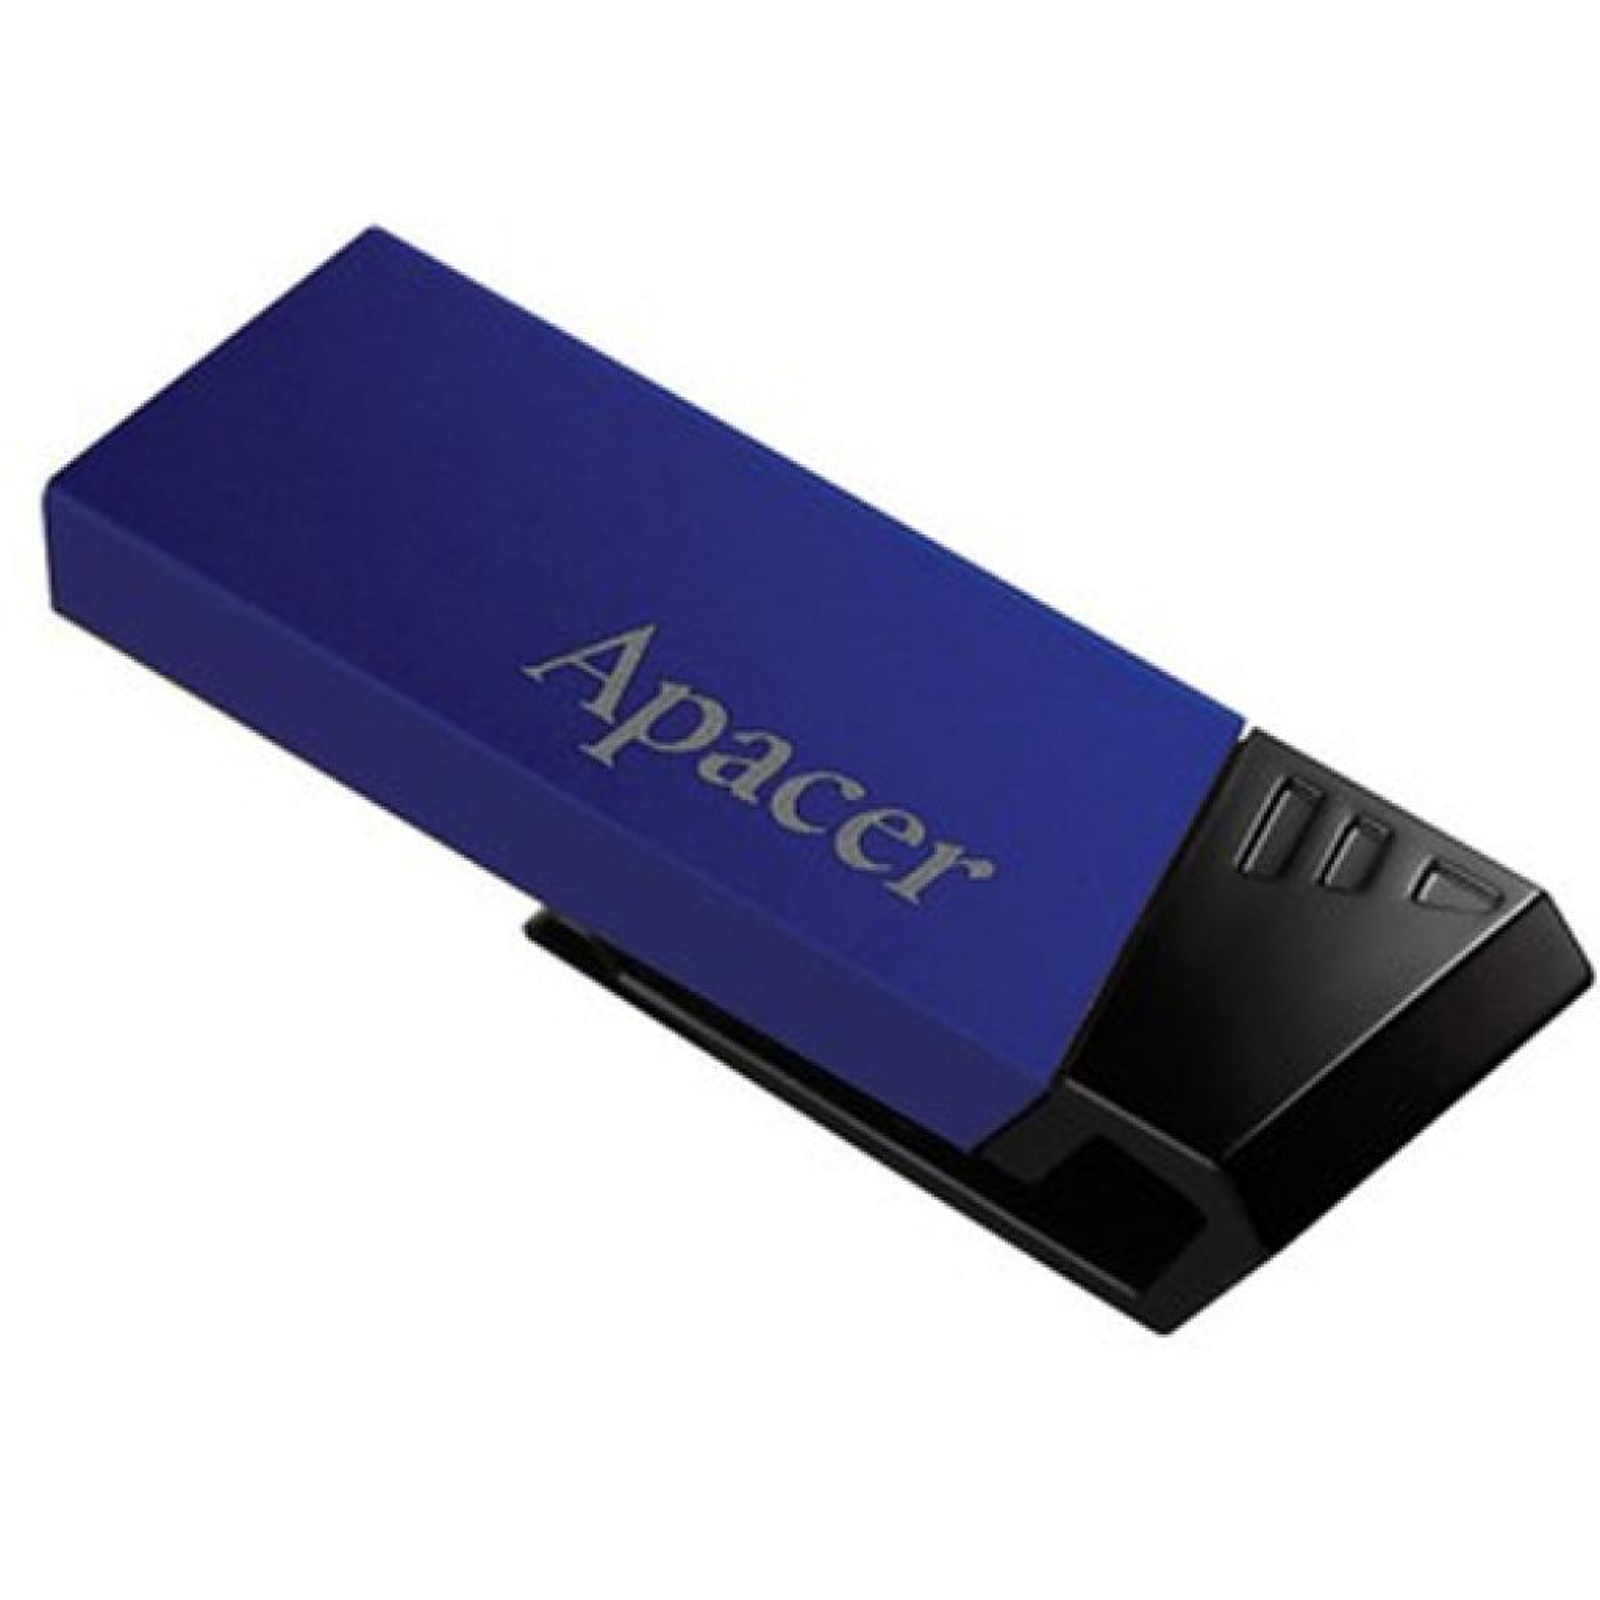 USB флеш накопитель 8GB AH131 Blue RP USB2.0 Apacer (AP8GAH131U-1) изображение 3